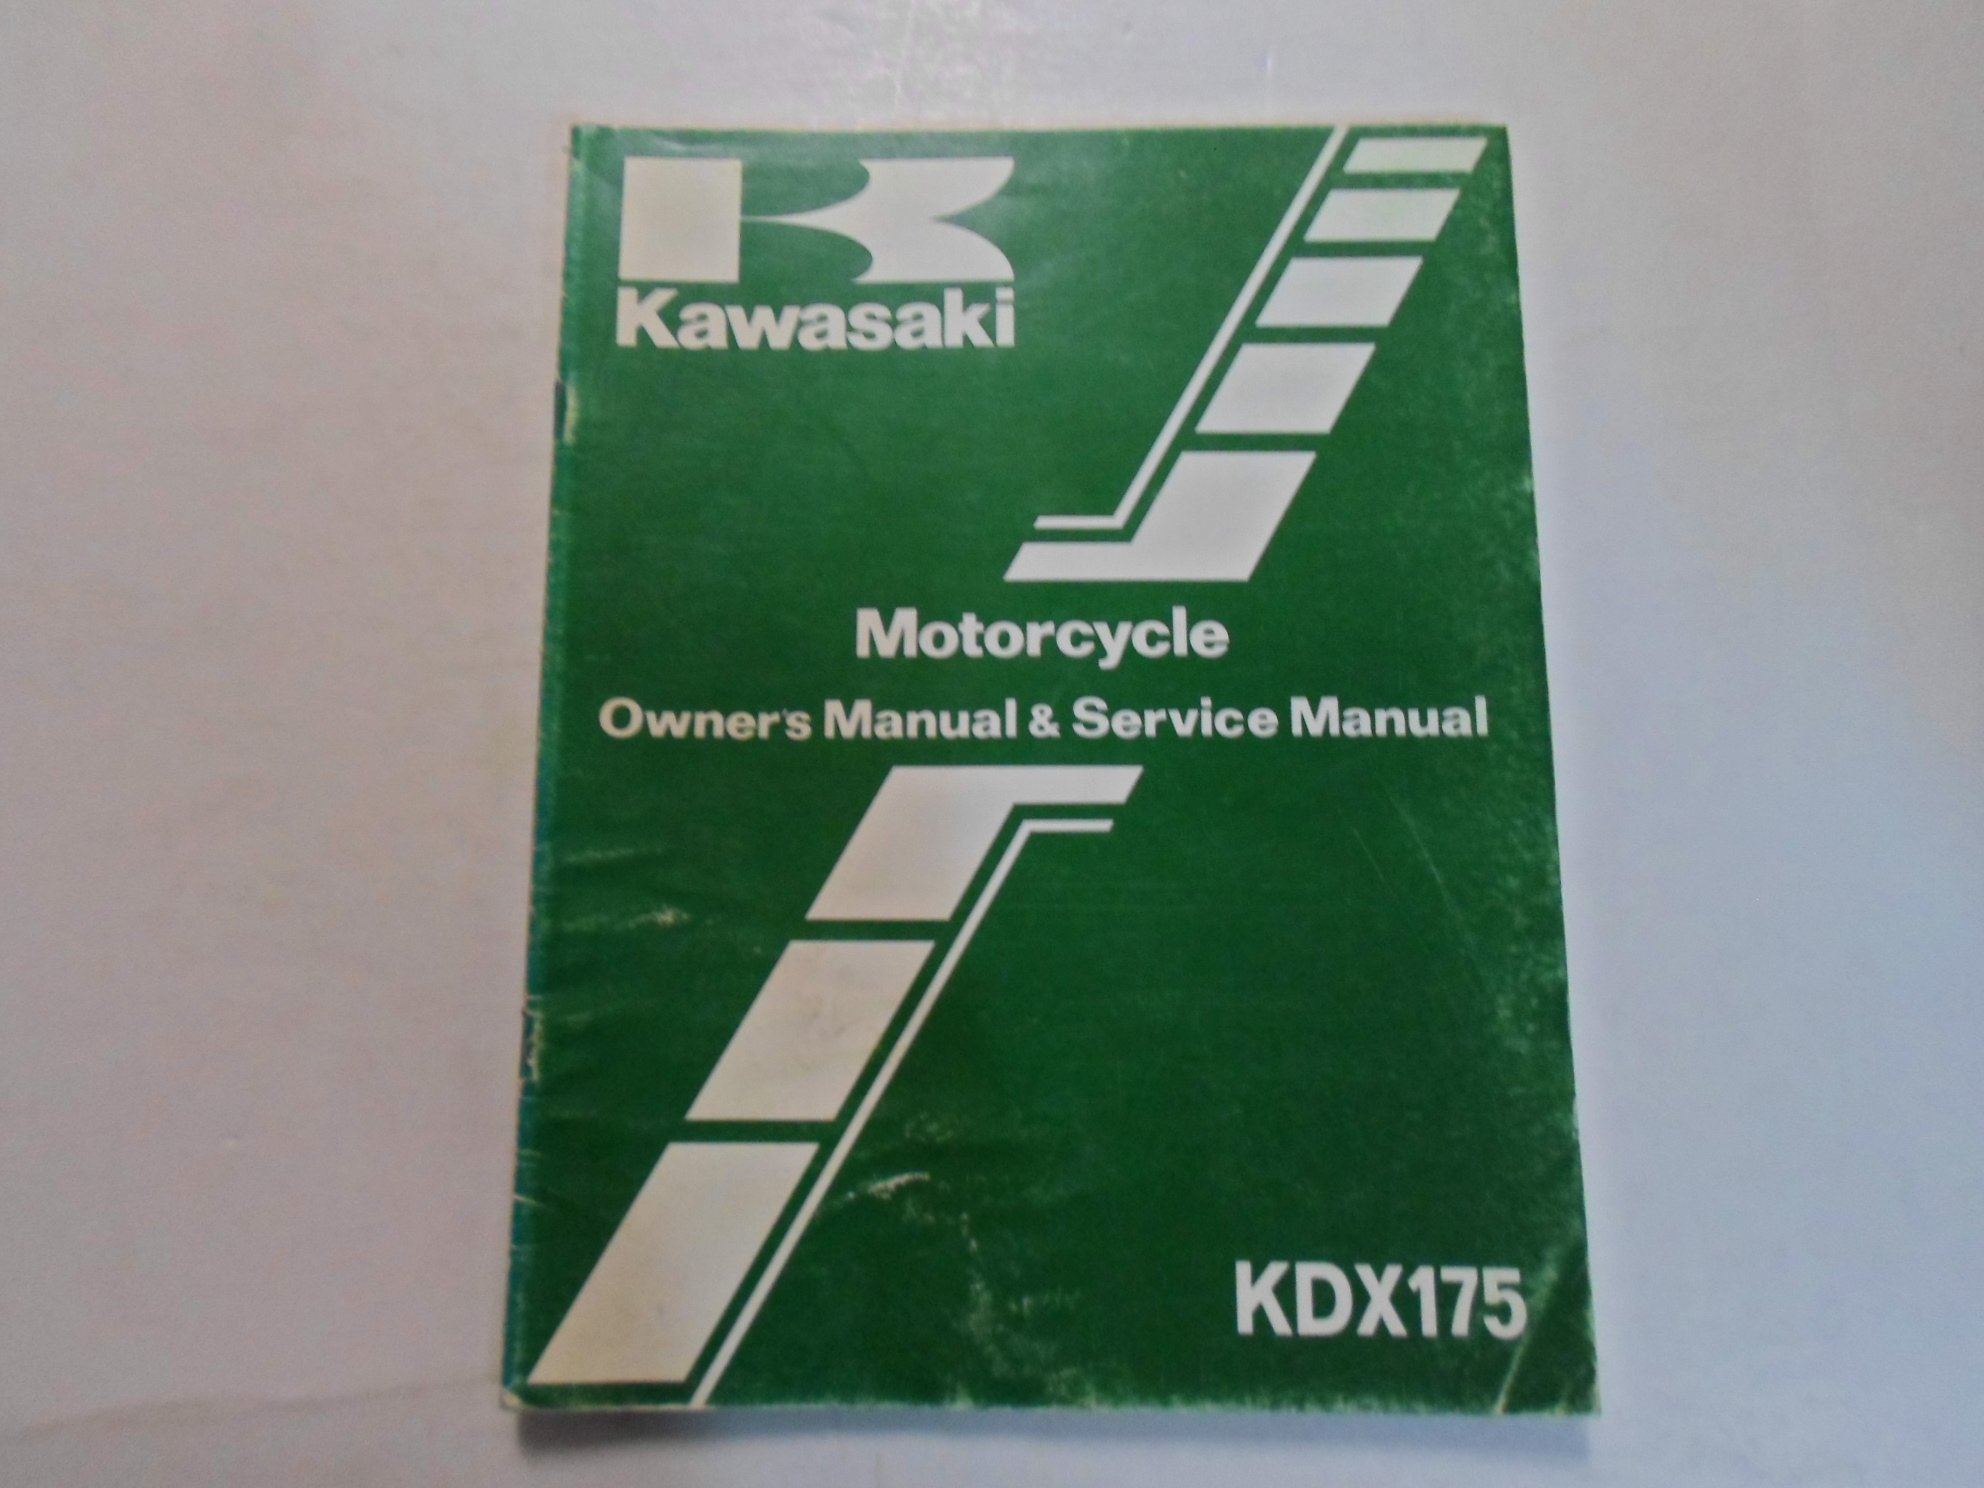 1982 Kawasaki KDX175 Owners Manual & Service Manual WATER DAMAGED WORN  FACTORY: Kawasaki: Amazon.com: Books